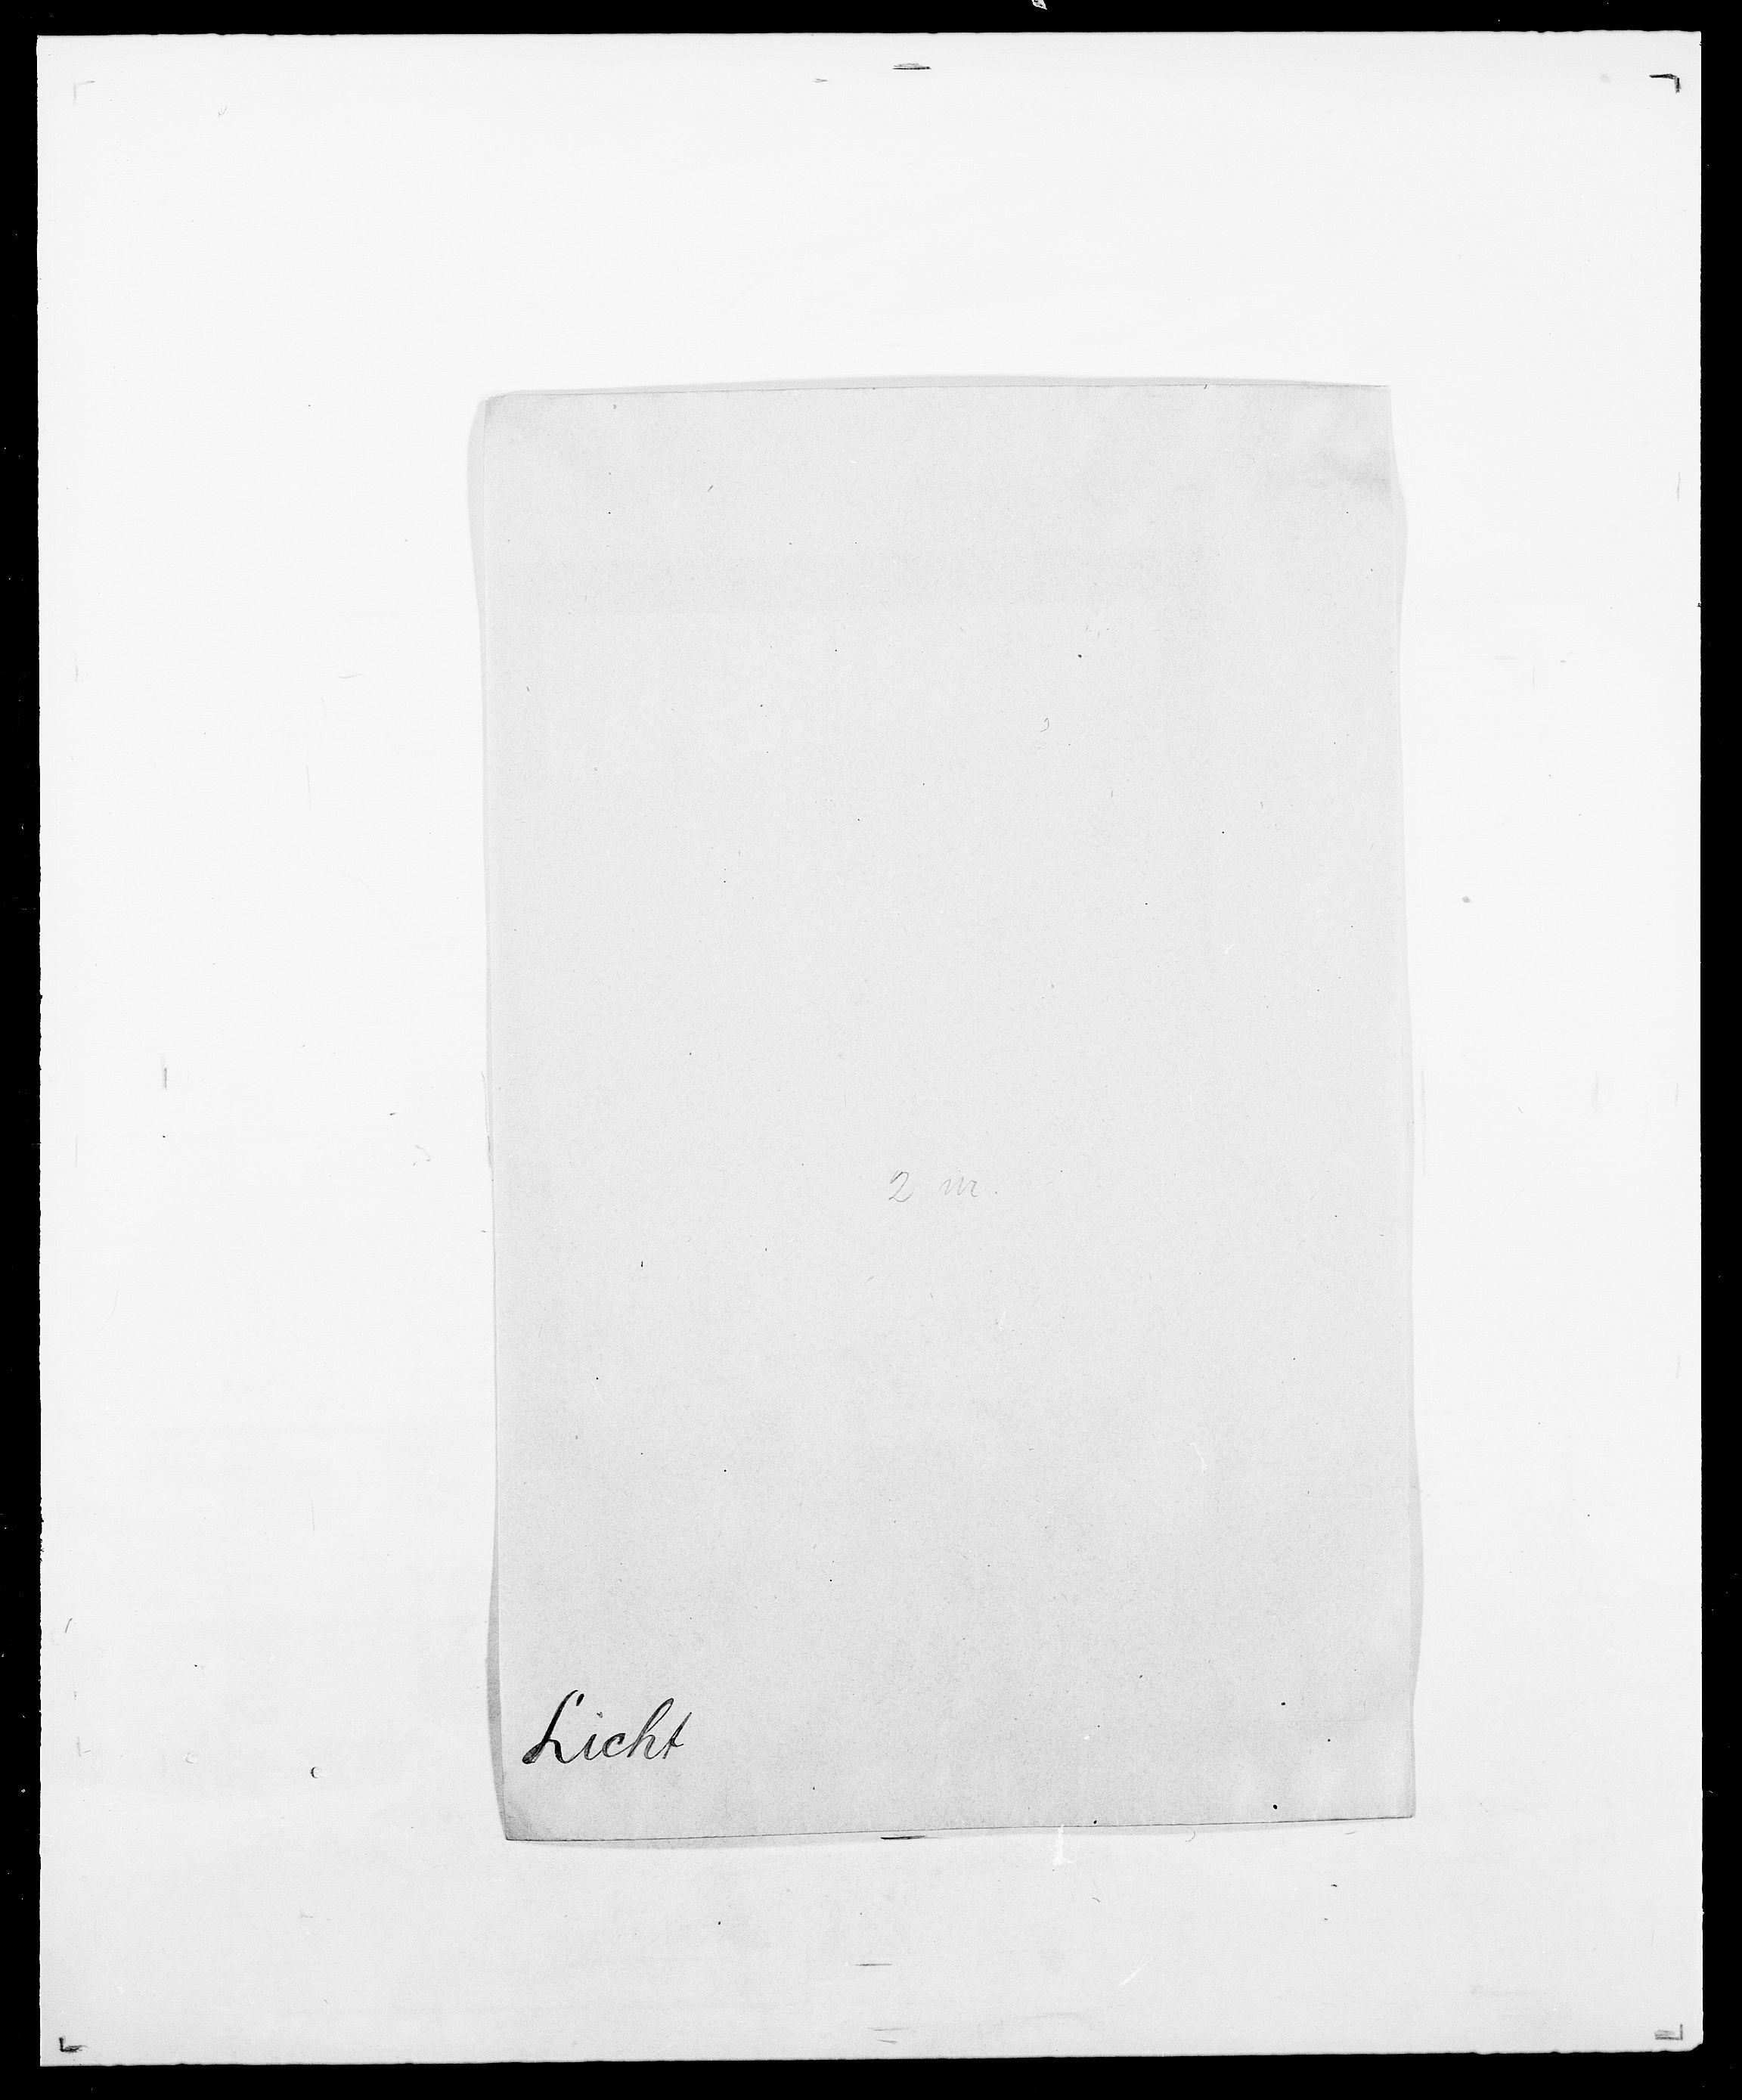 SAO, Delgobe, Charles Antoine - samling, D/Da/L0023: Lau - Lirvyn, s. 315